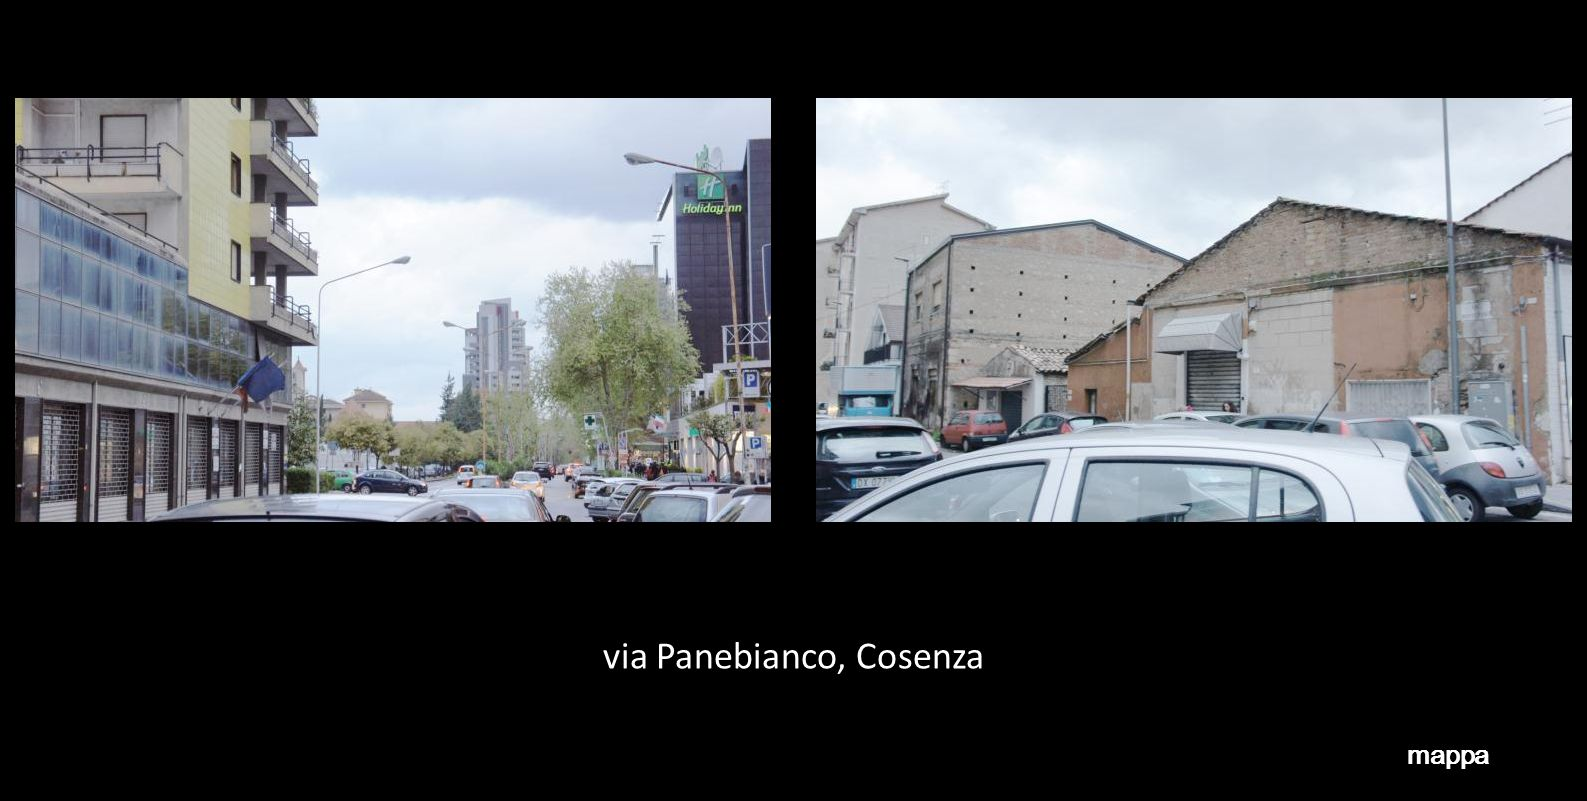 via Panebianco, Cosenza